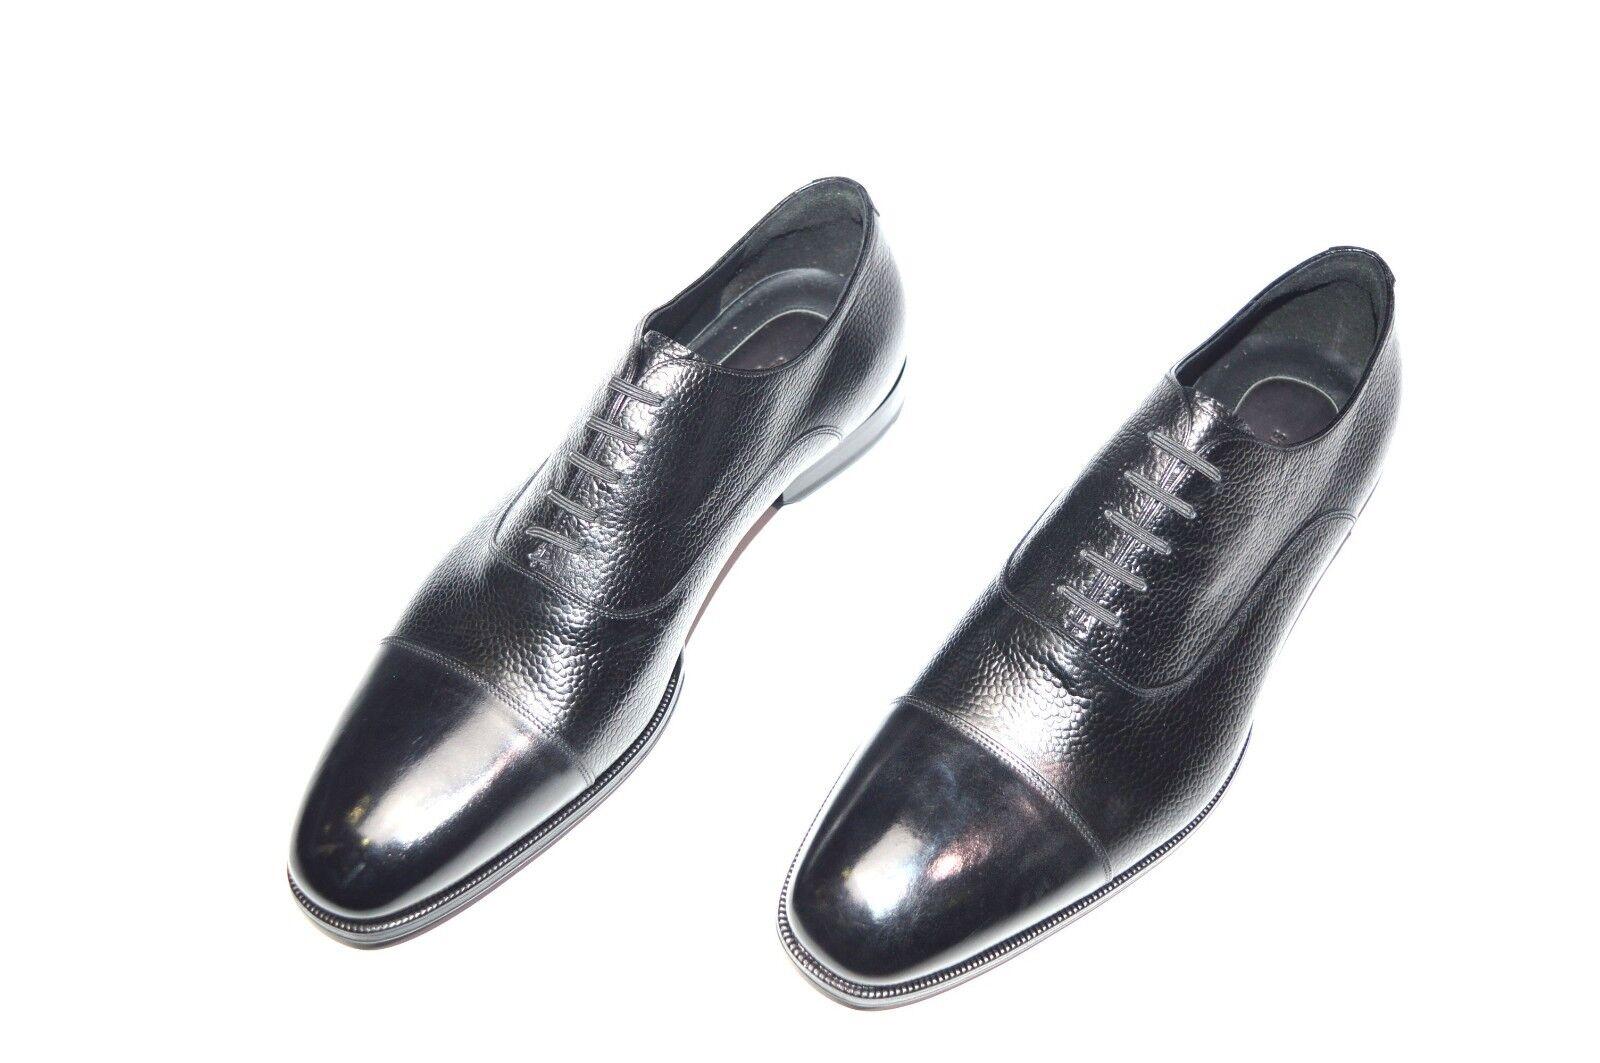 NEW STEFANO RICCI Leather  Luxury shoes Size Eu 42 Us 9 (Cod S717)